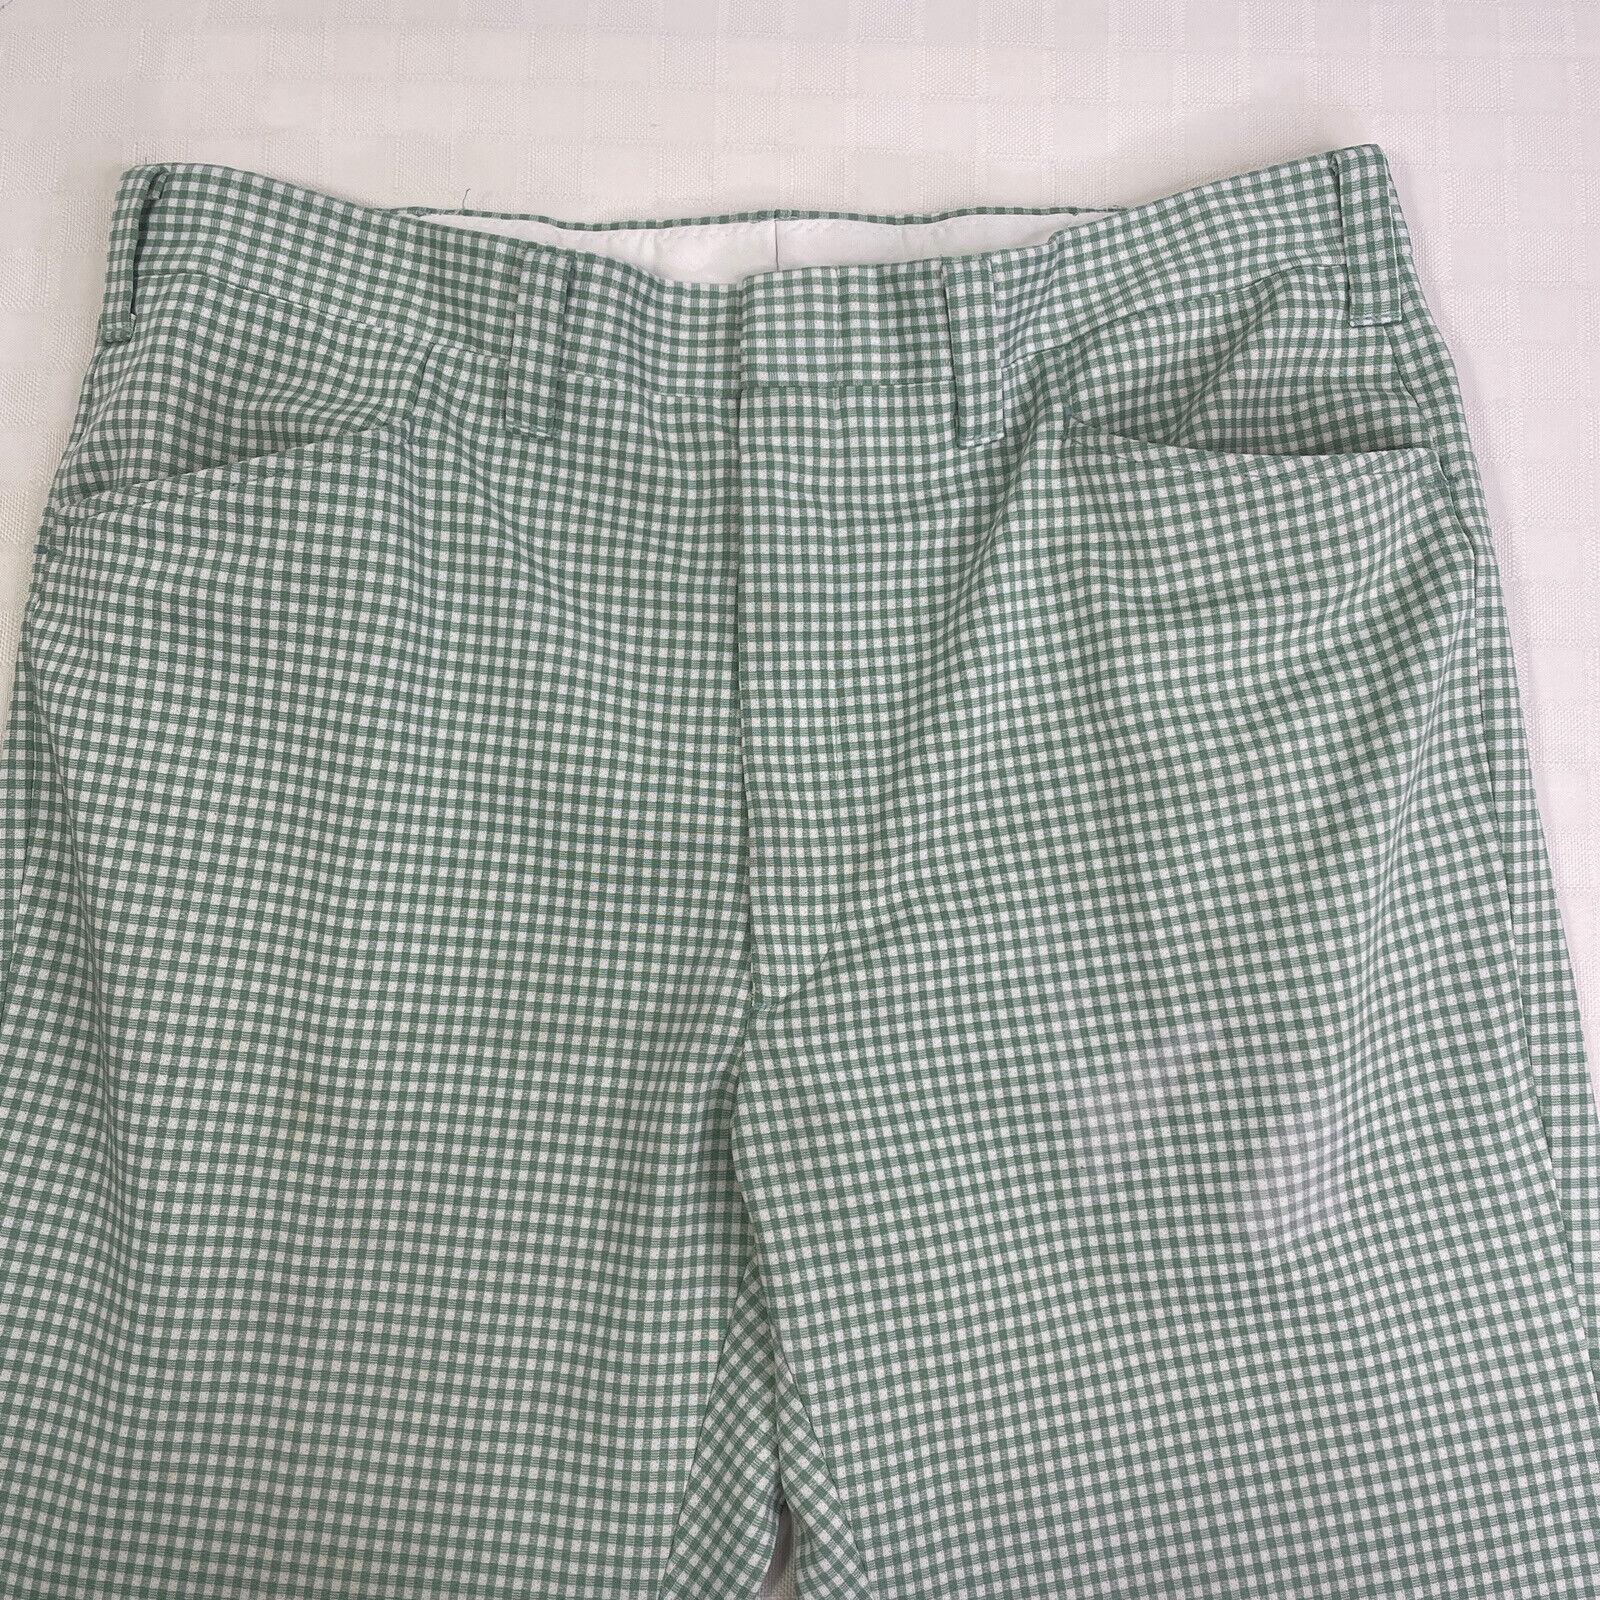 Haggar Green Plaid Check Leisure Golf Pants Vinta… - image 3